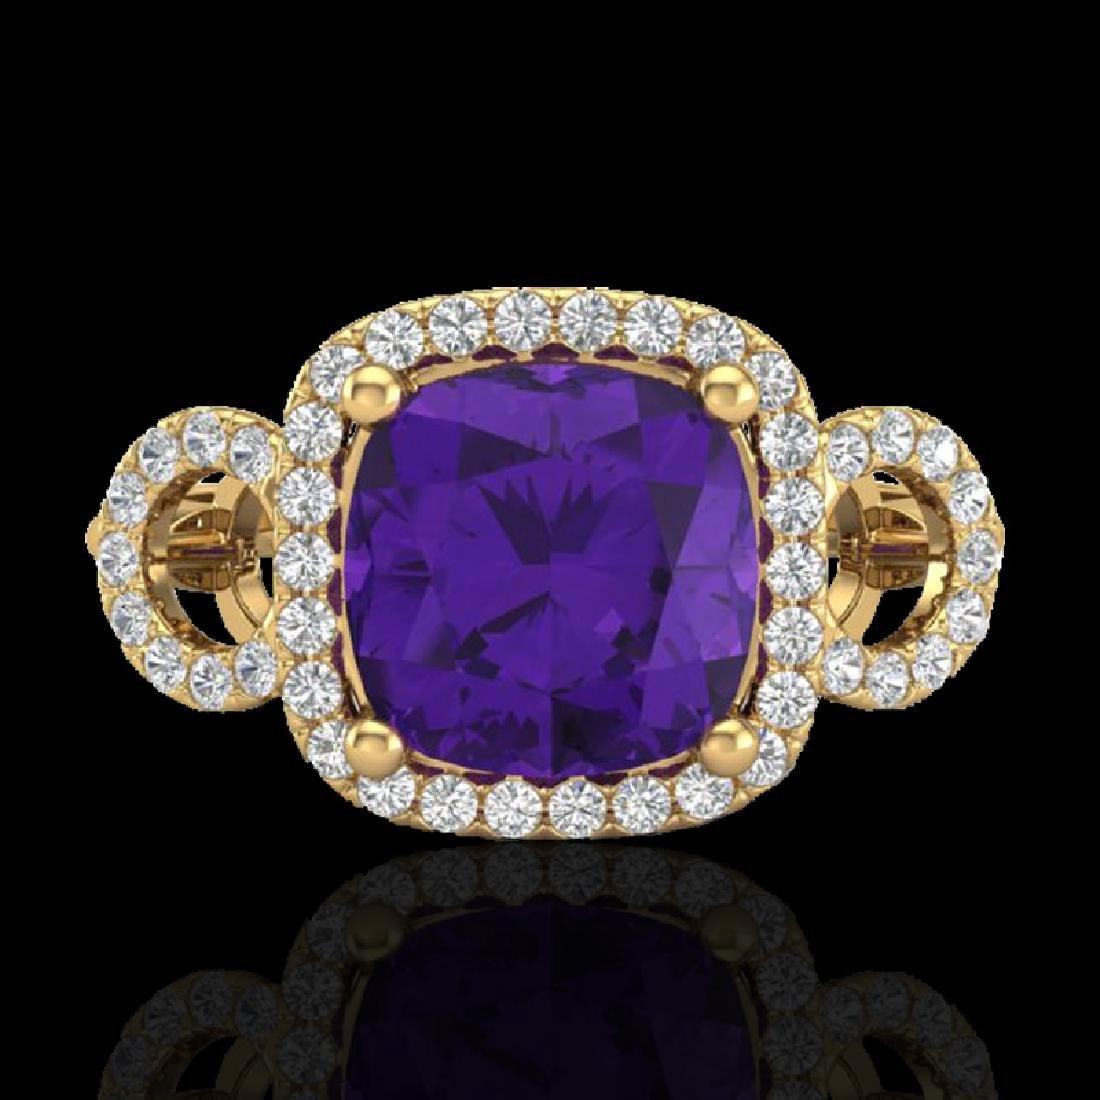 3.75 CTW Amethyst & Micro SI Diamond Certified Ring 18K